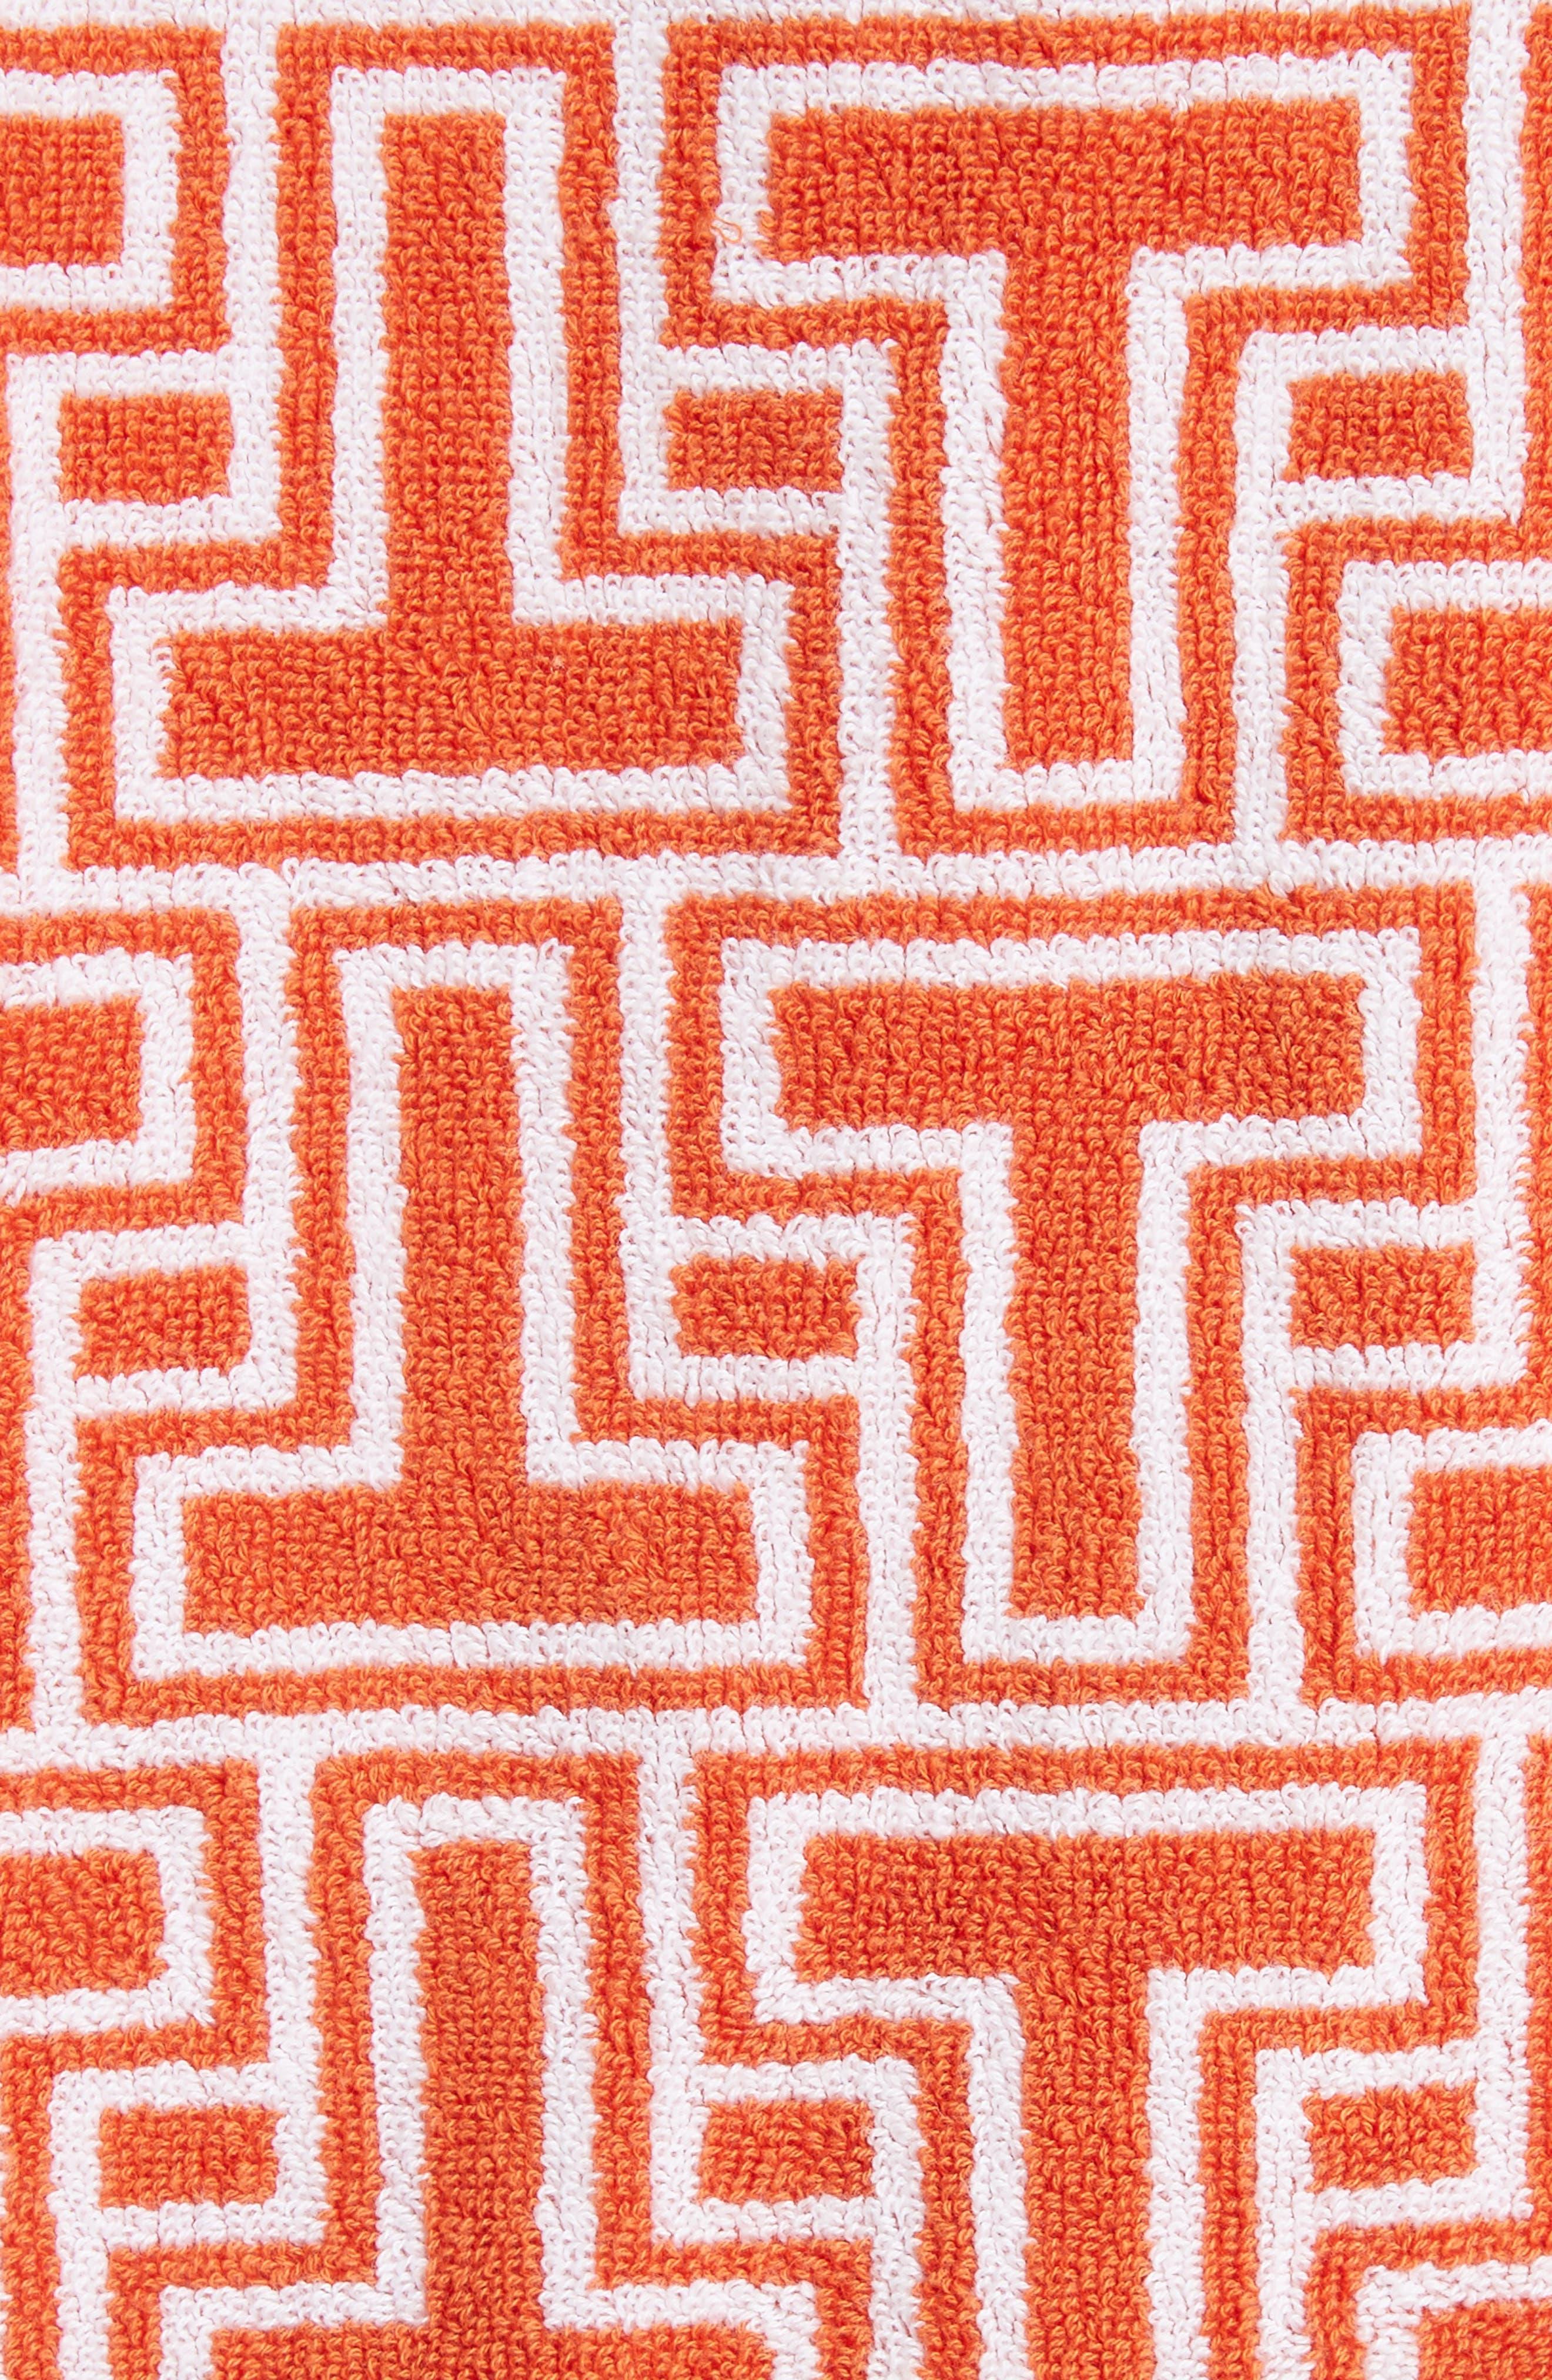 Tile T Terry Coat,                             Alternate thumbnail 5, color,                             Orange Towel Jacquard